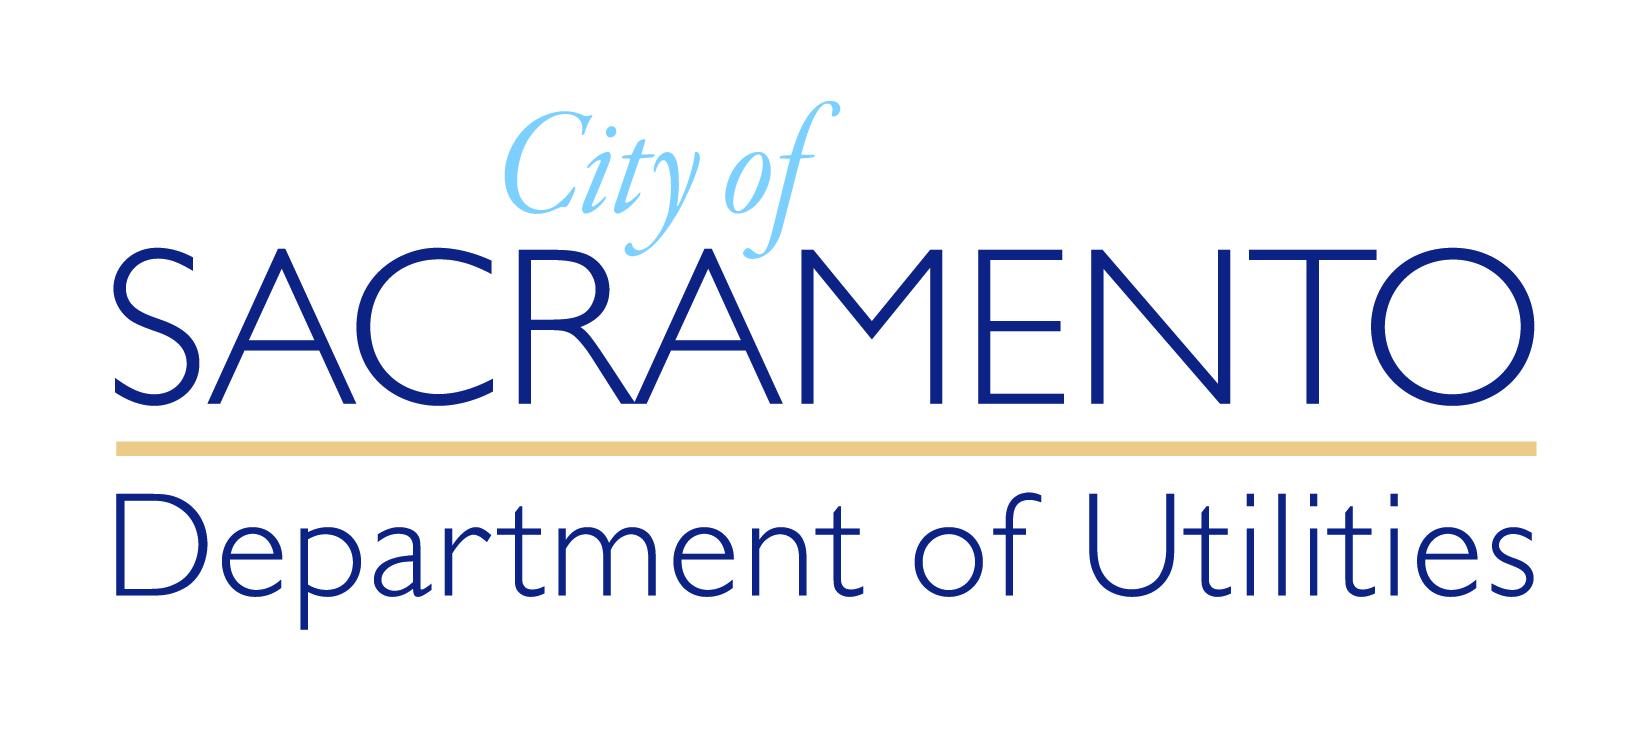 City of Sacramento Department of Utilities Logo.jpg